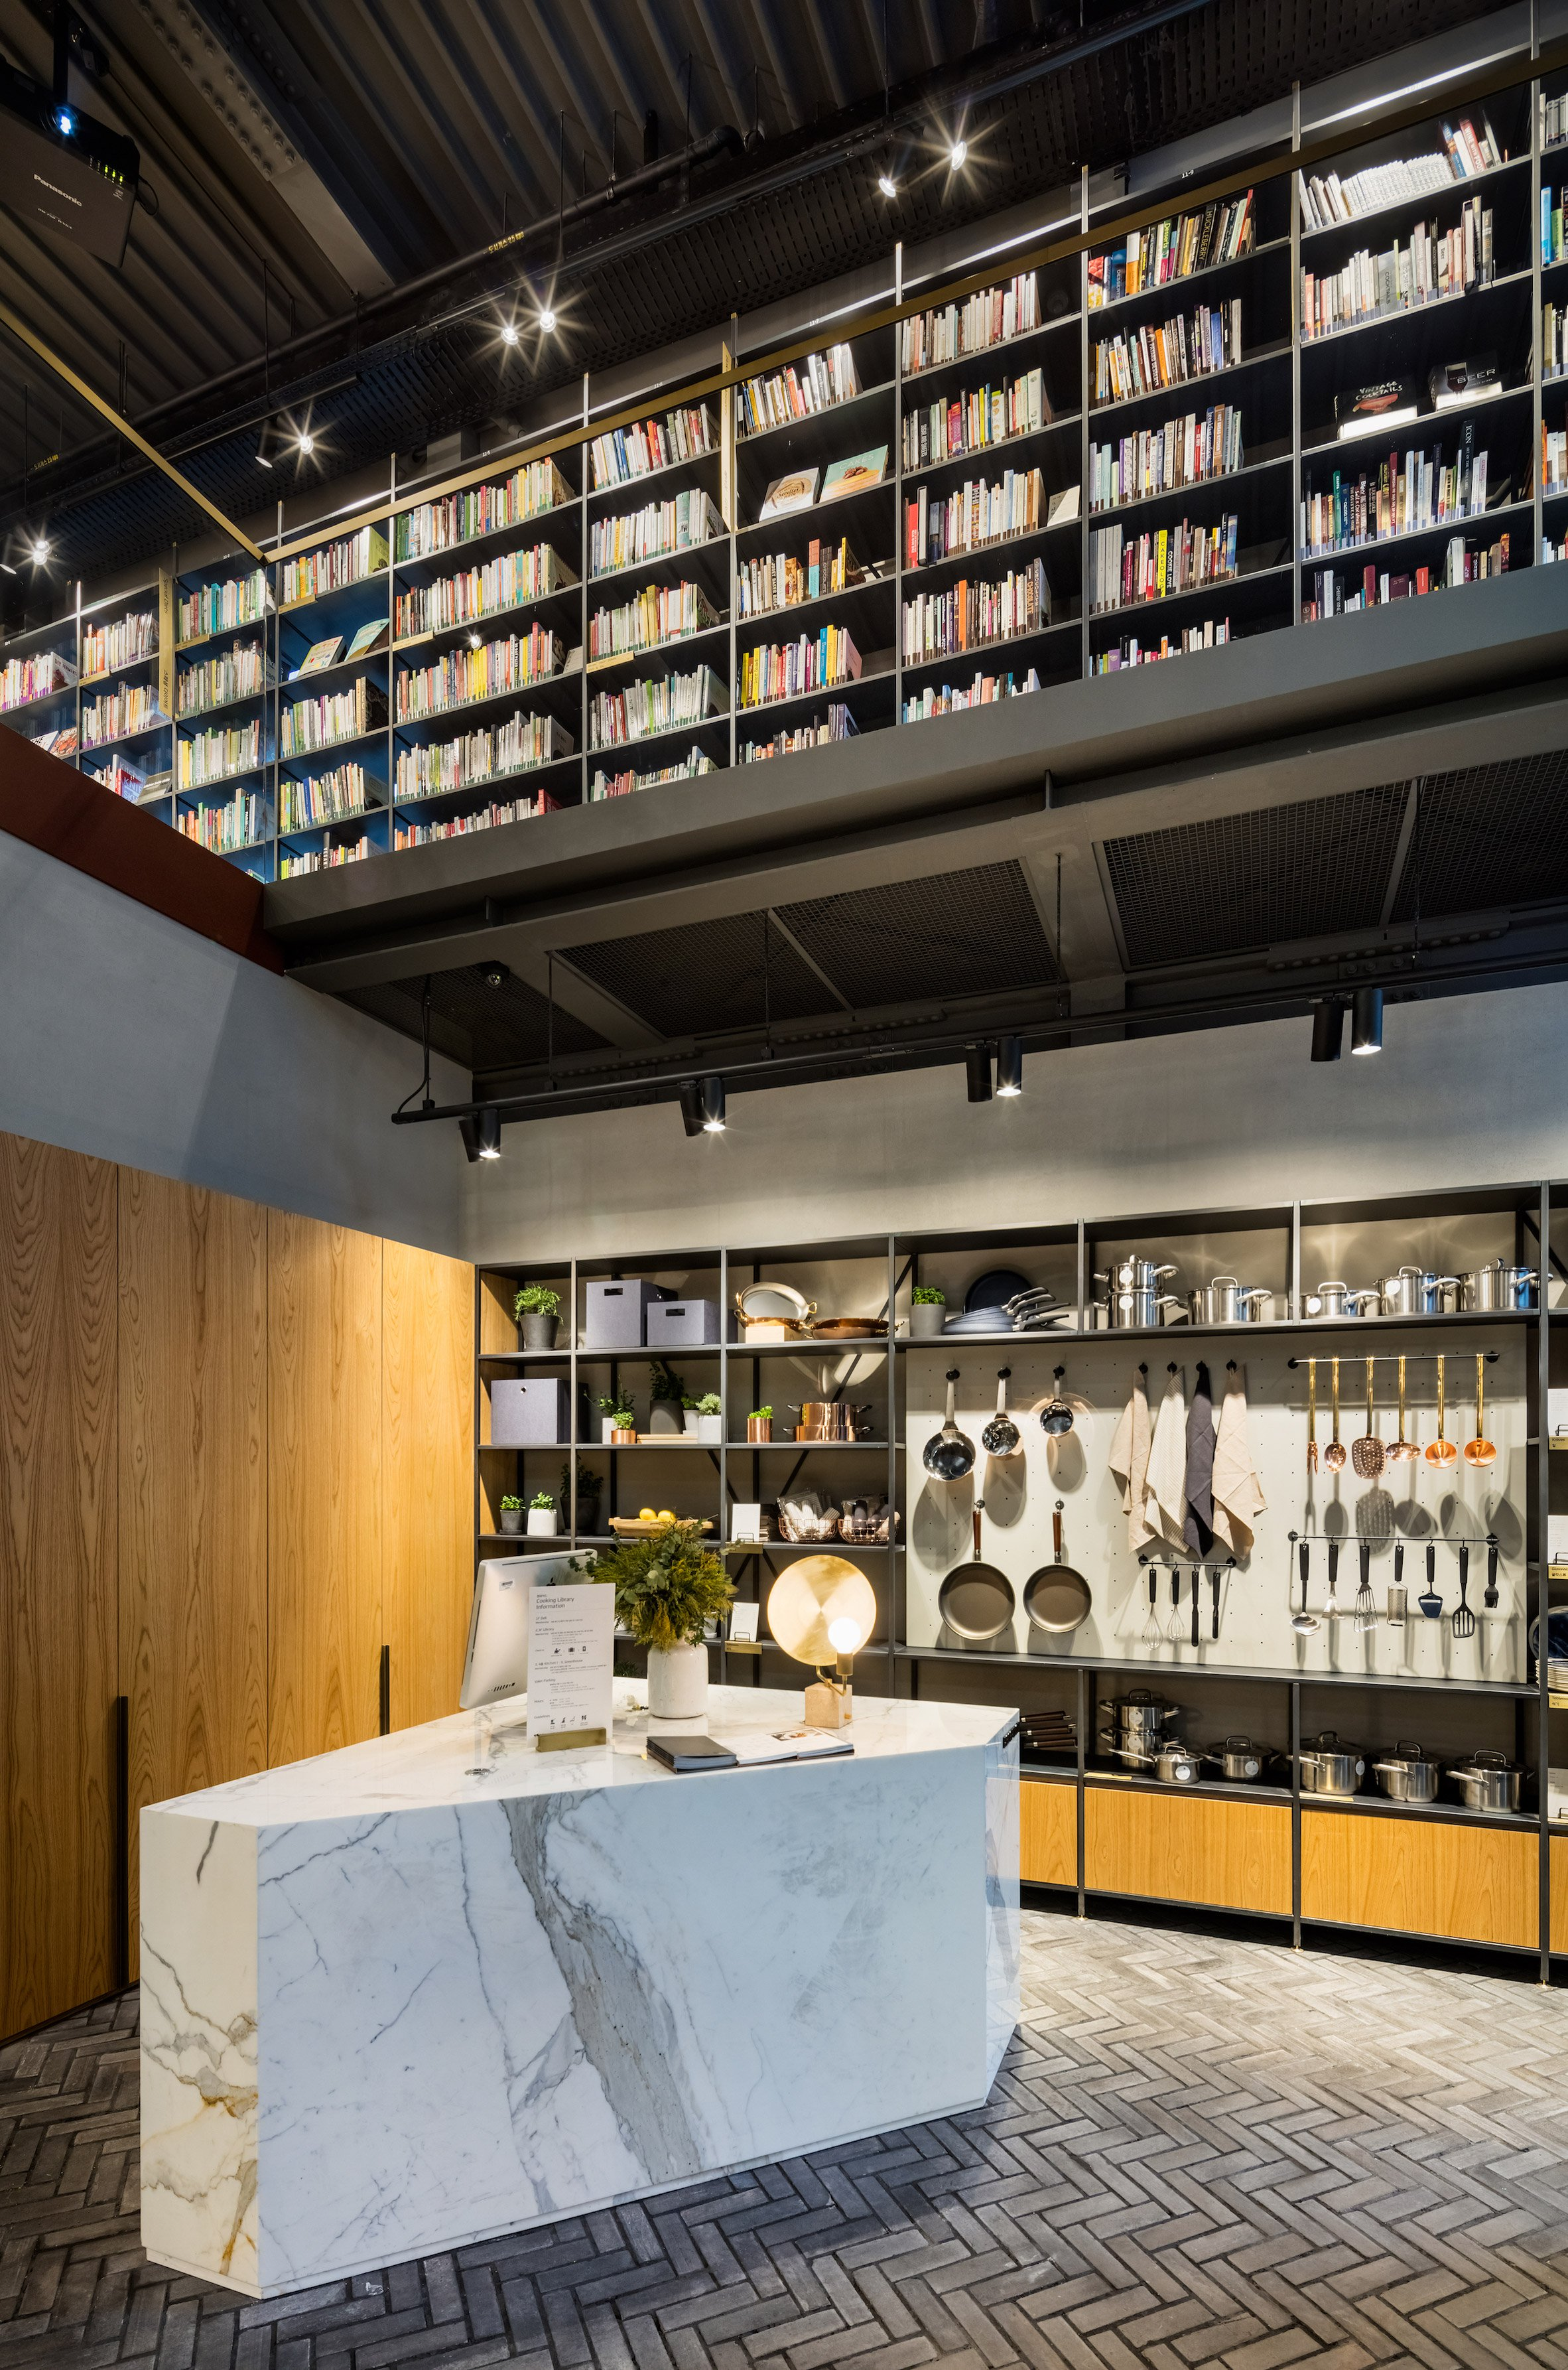 cooking-library-blacksheep-interiors_dezeen_2364_col_5.jpg